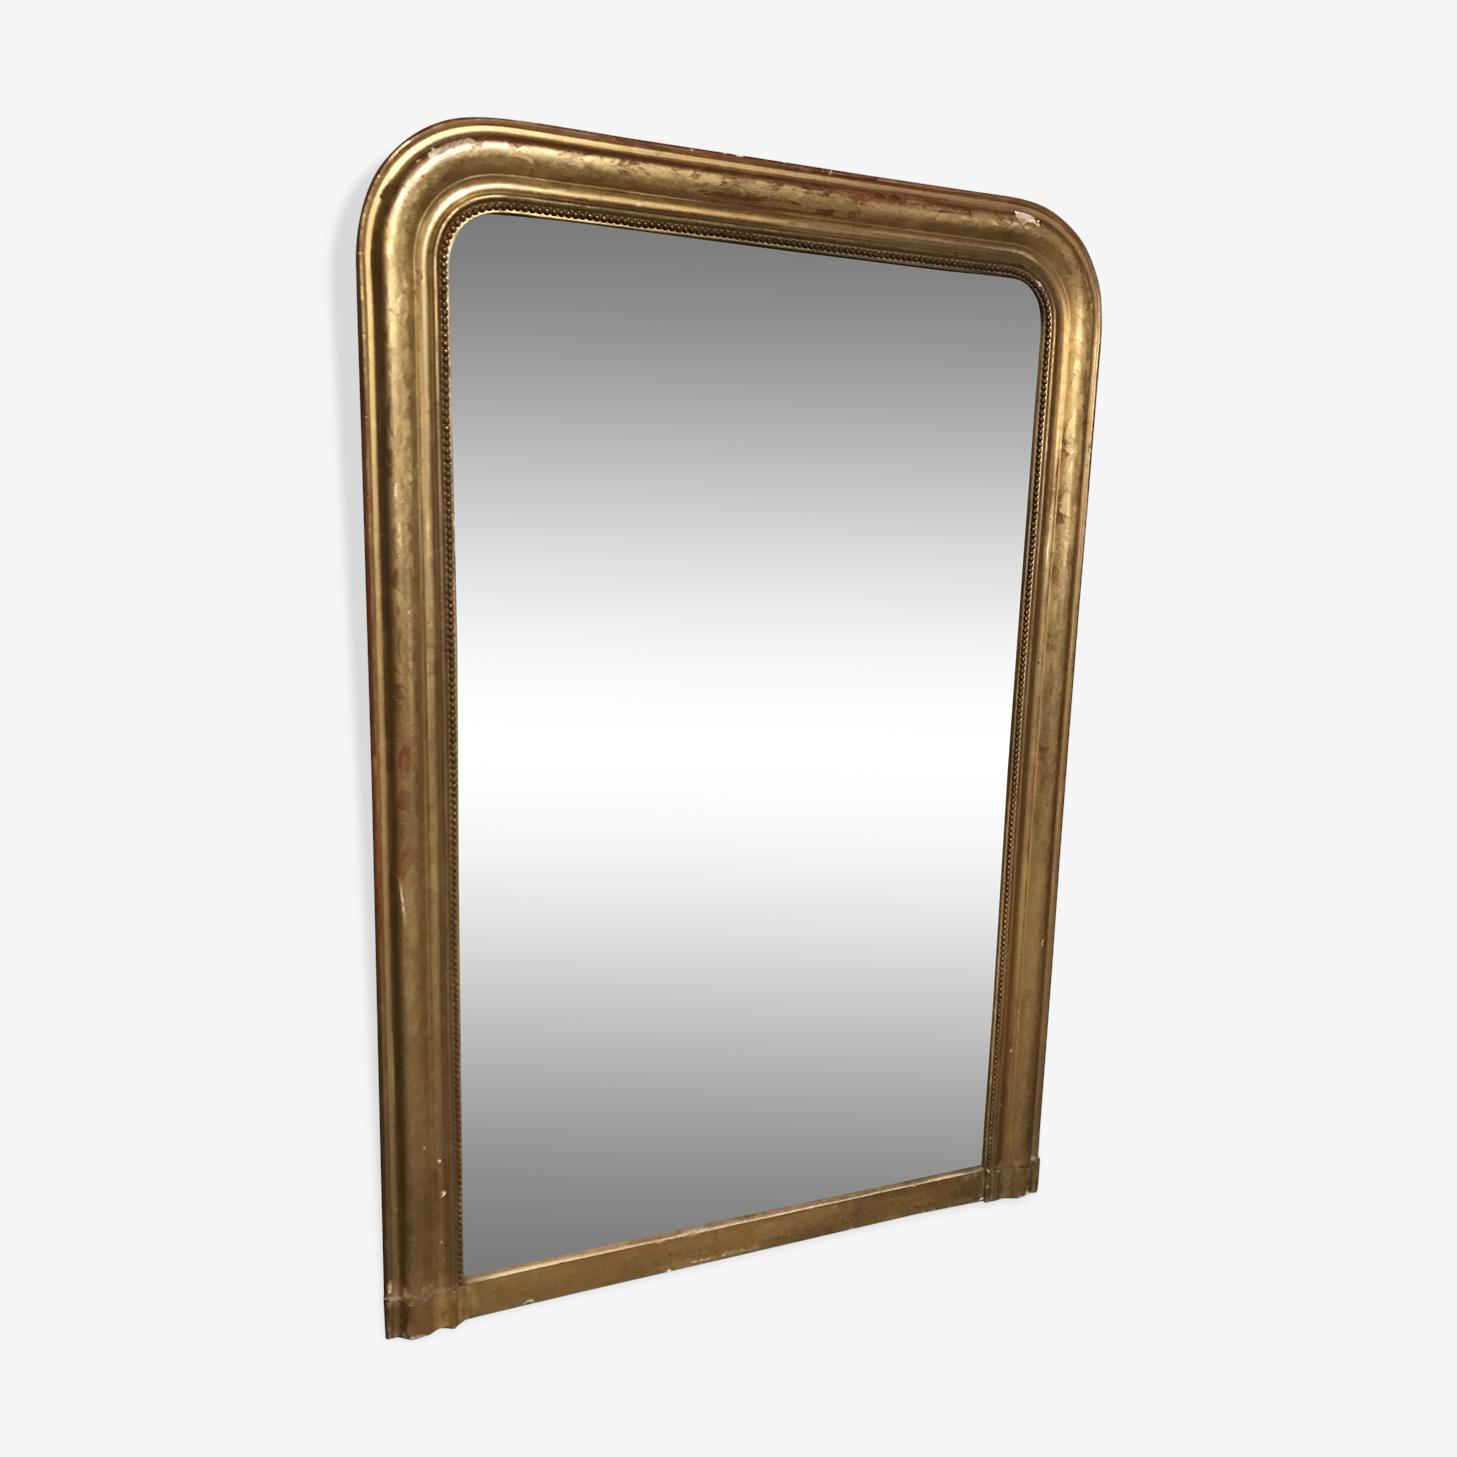 Miroir Louis Philippe feuille d'or, 95x141cm